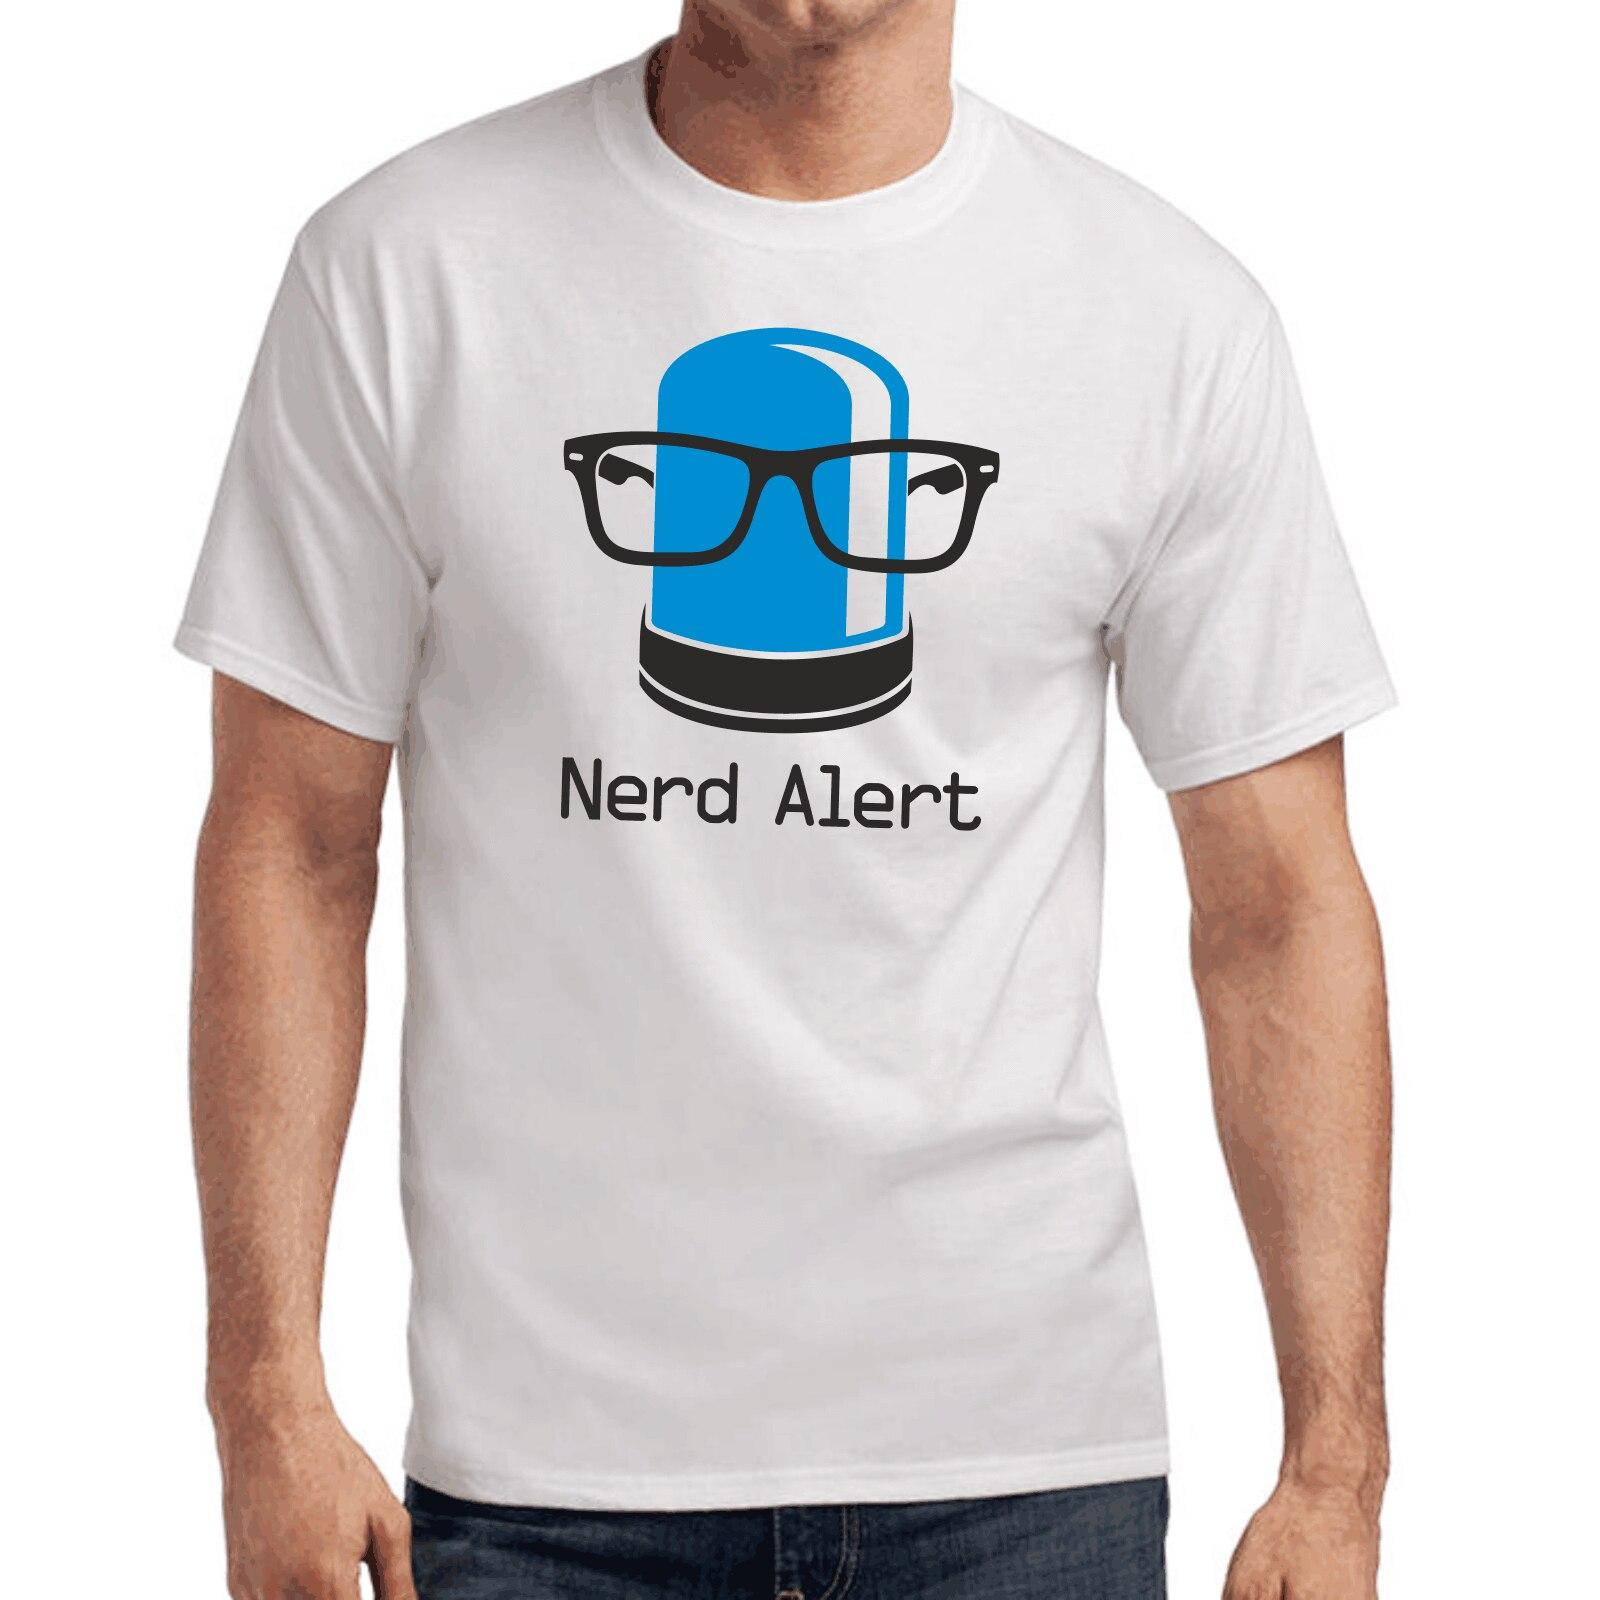 Ботаник оповещения  Geek  геймер  компьютер  PC  Забава Kult  S-3XL футболка Для мужчин лето Рубашка с короткими рукавами футболка рубашка Аниме